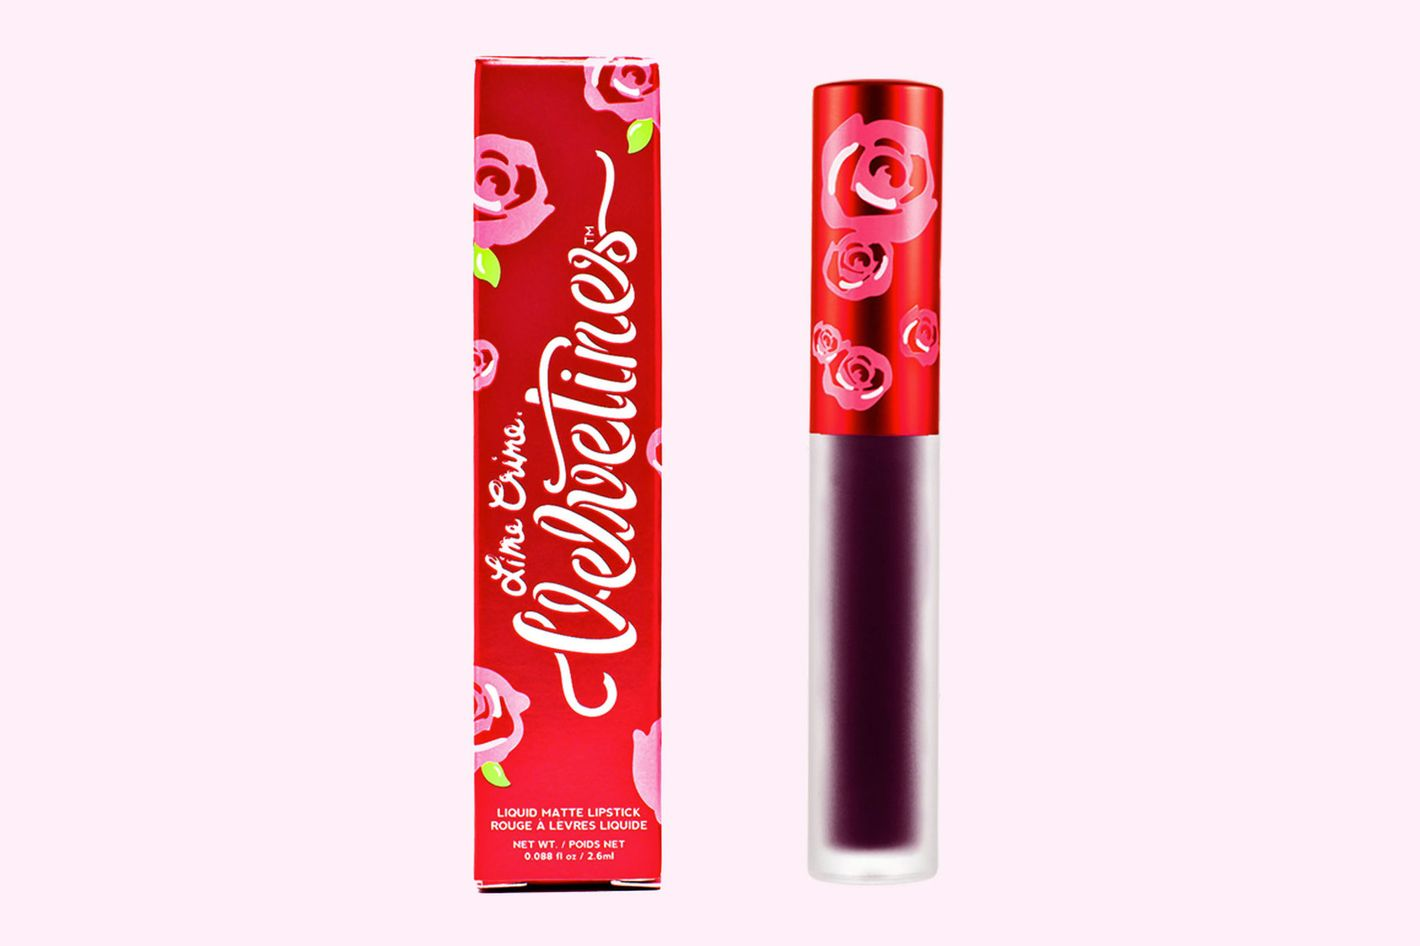 Lime Crime Velvetine Lipstick in Bloodmoon